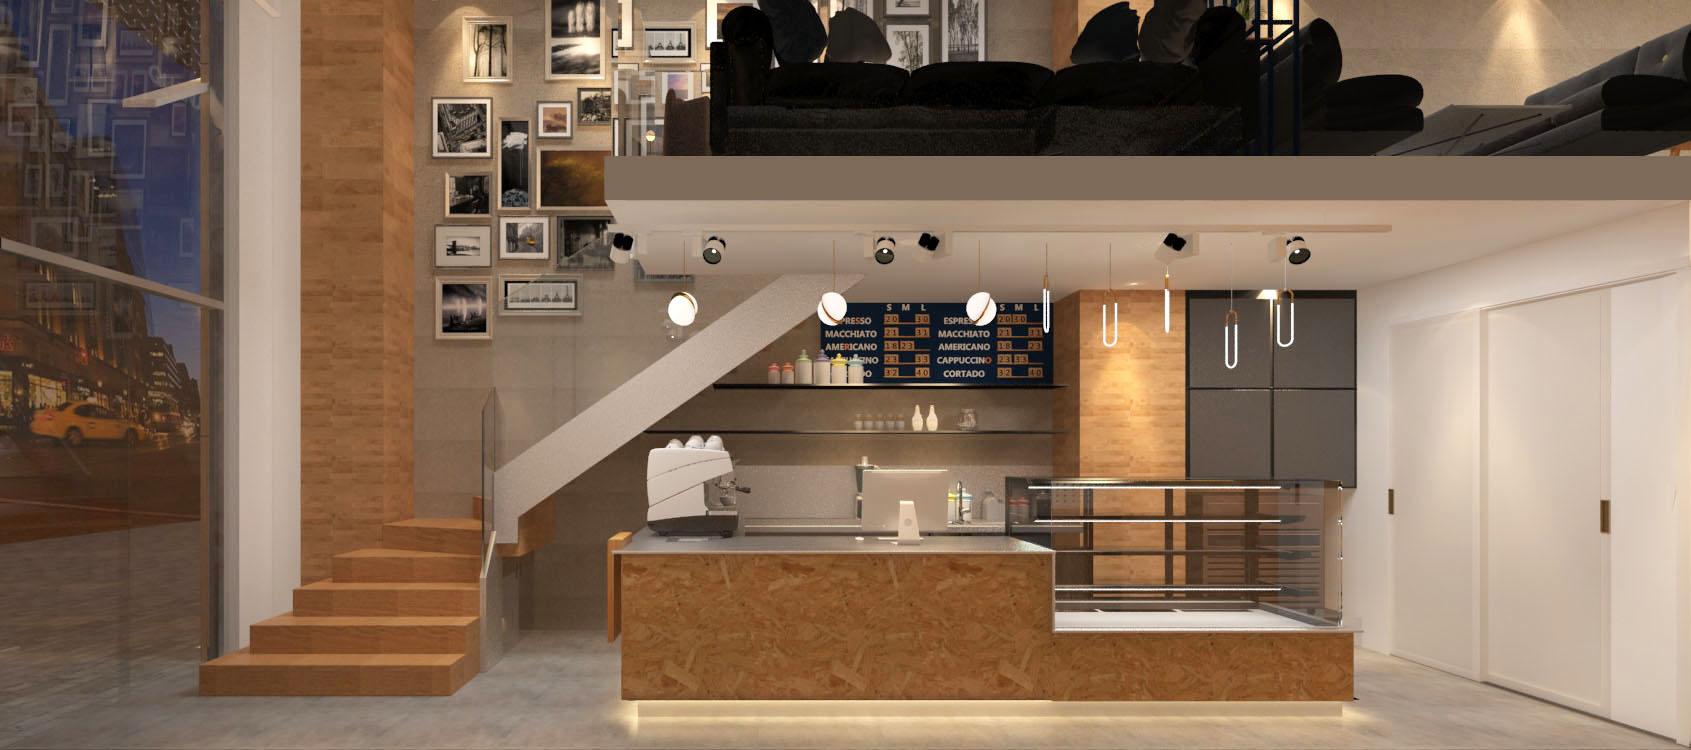 solar咖啡店设计效果图3